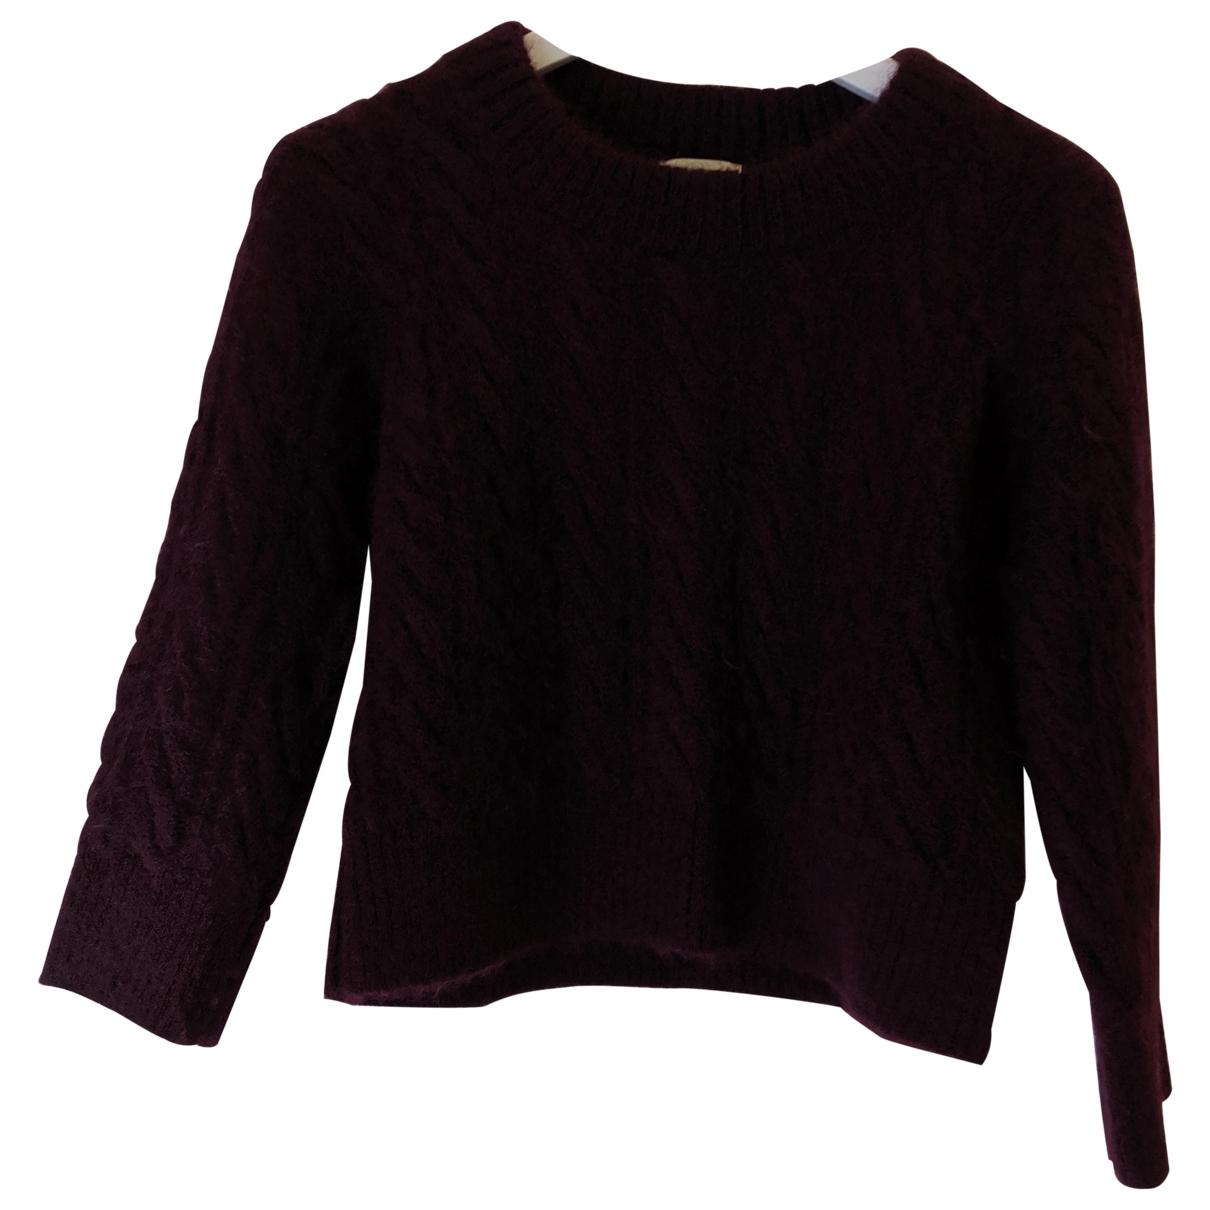 Erdem X H&m \N Pullover in  Bordeauxrot Wolle